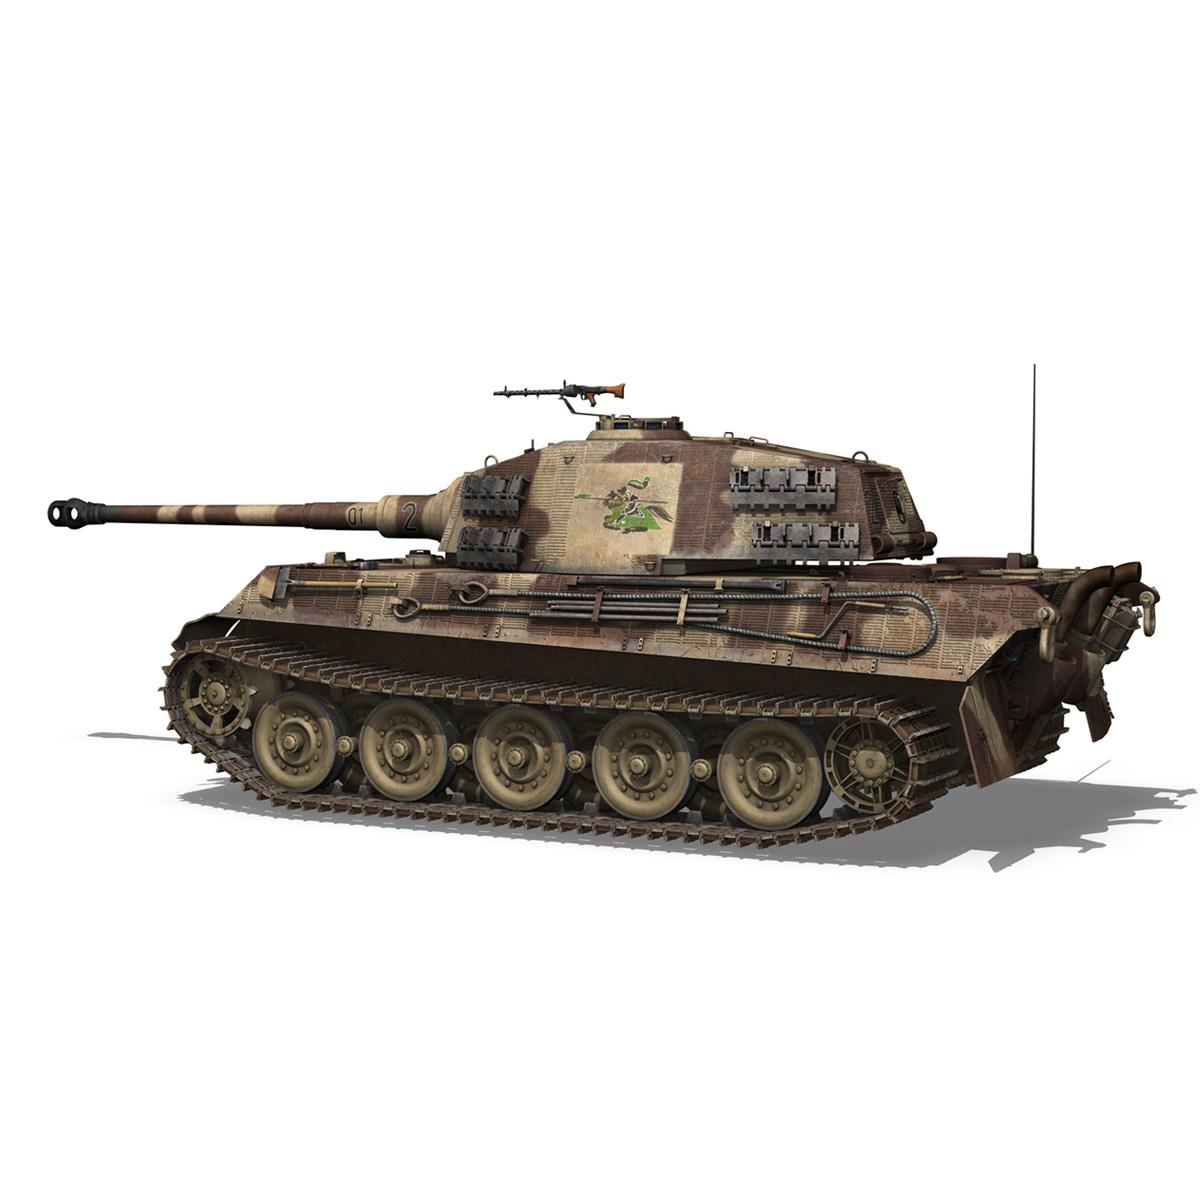 panzerkampfwagen vi – ausf b – tiger ii – 201 3d model 3ds c4d lwo lw lws obj 293304